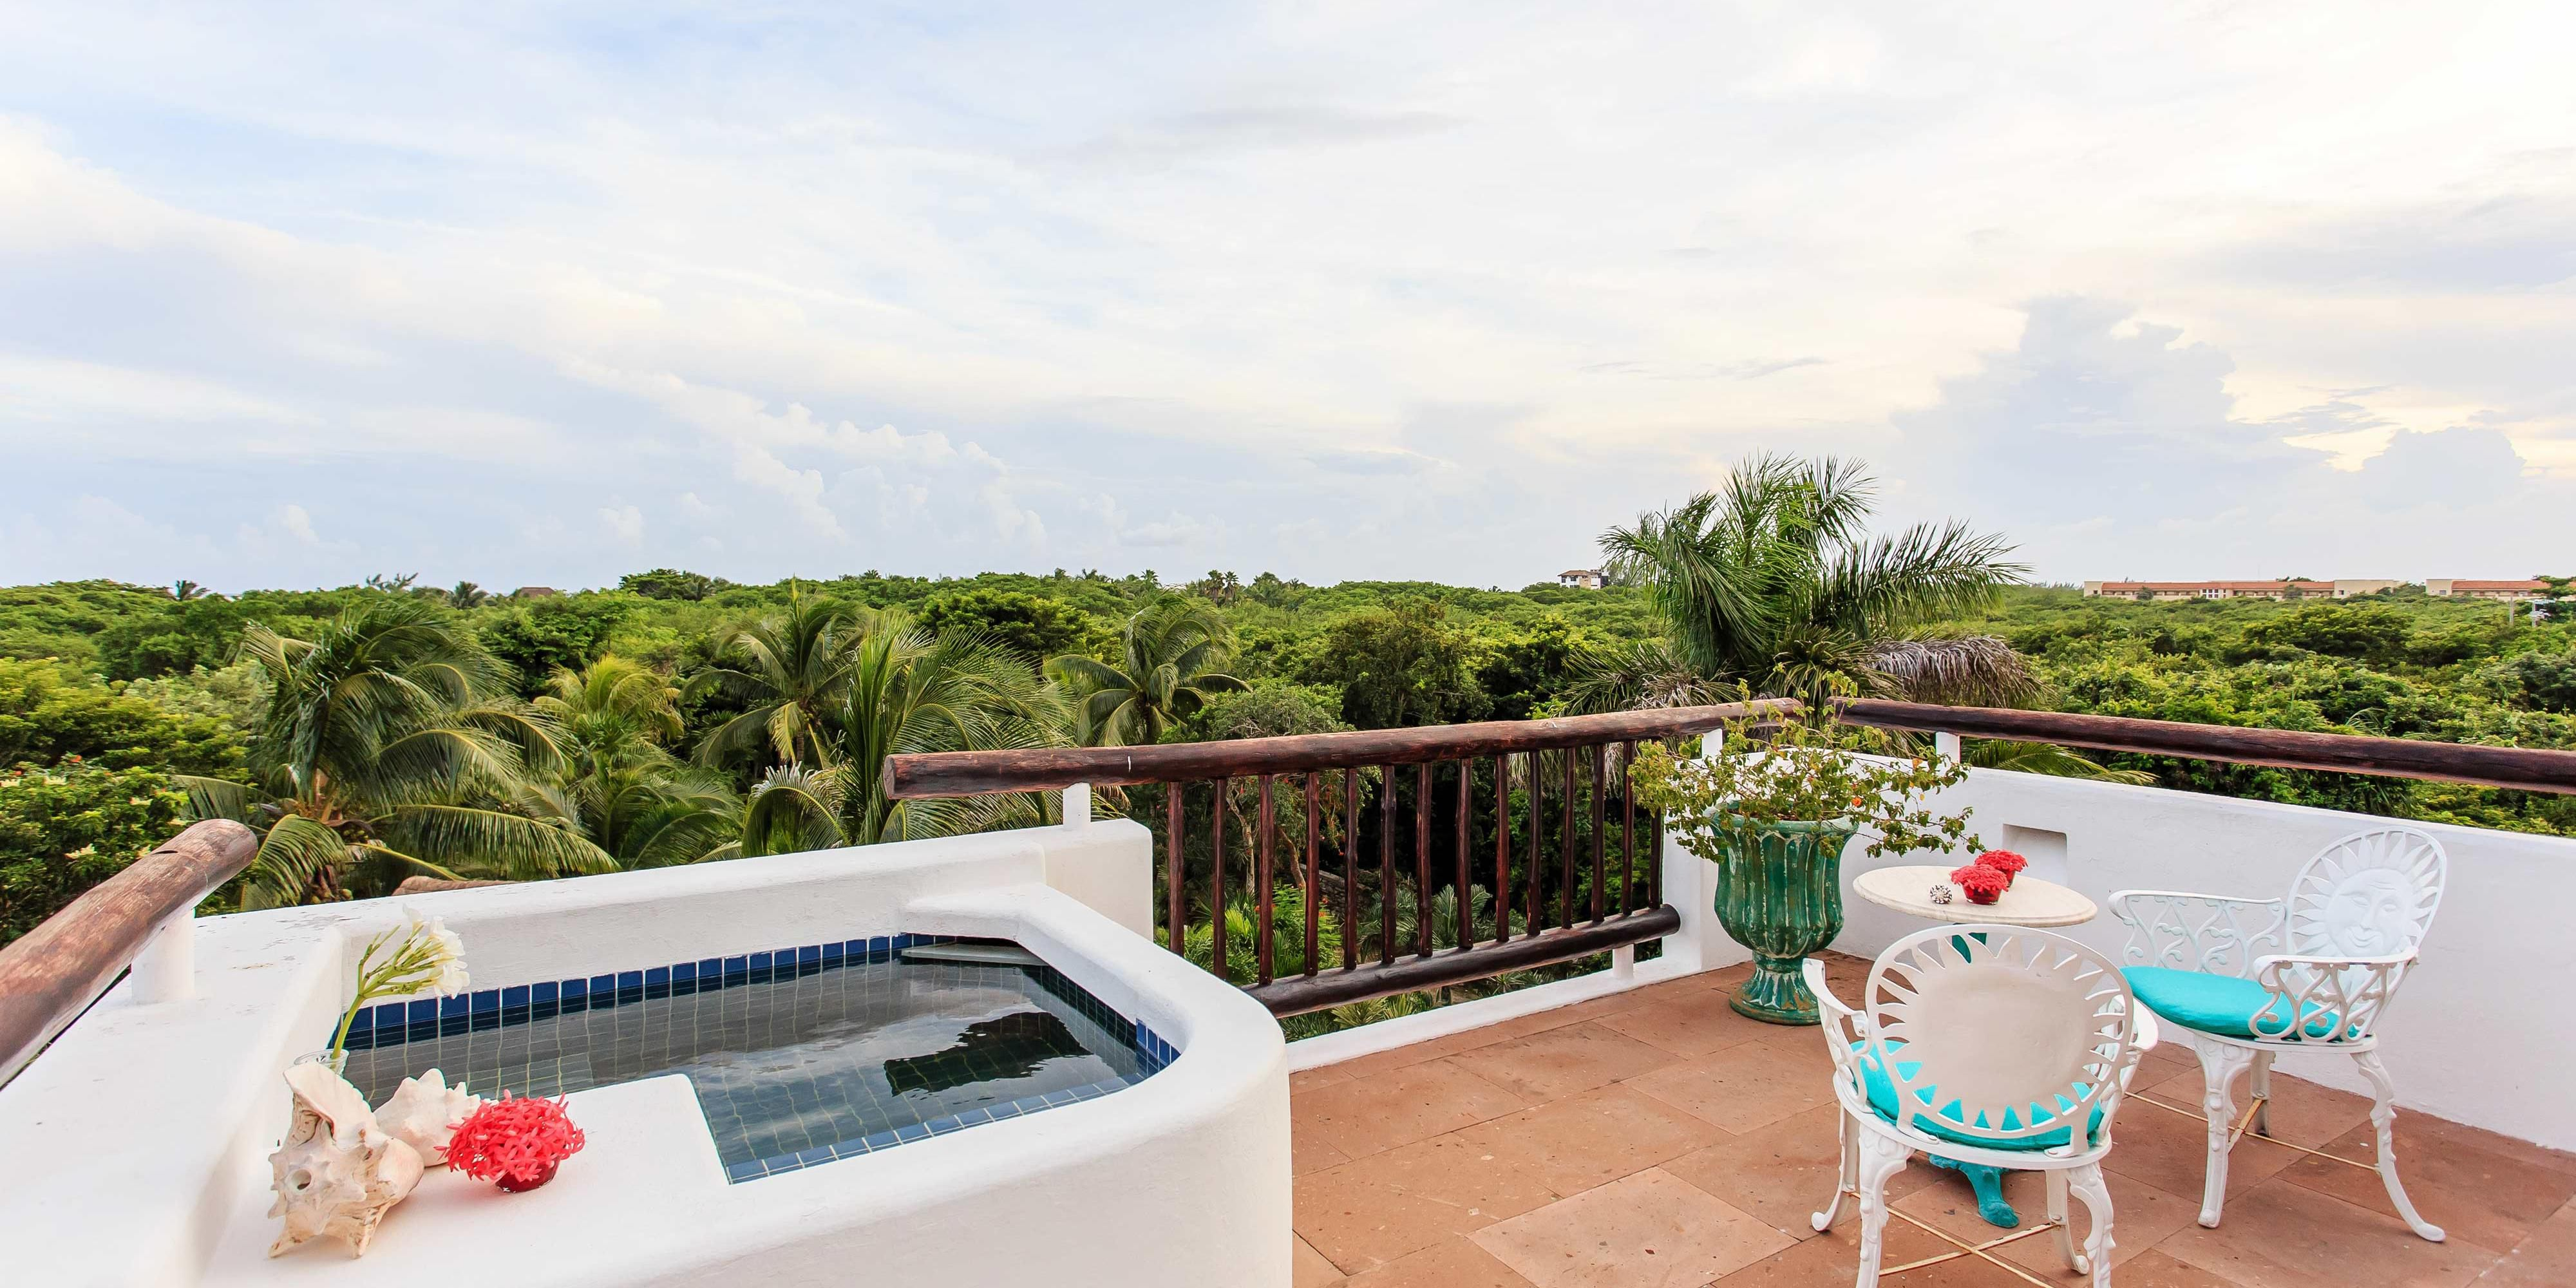 Private Villa terrace with jacuzzi